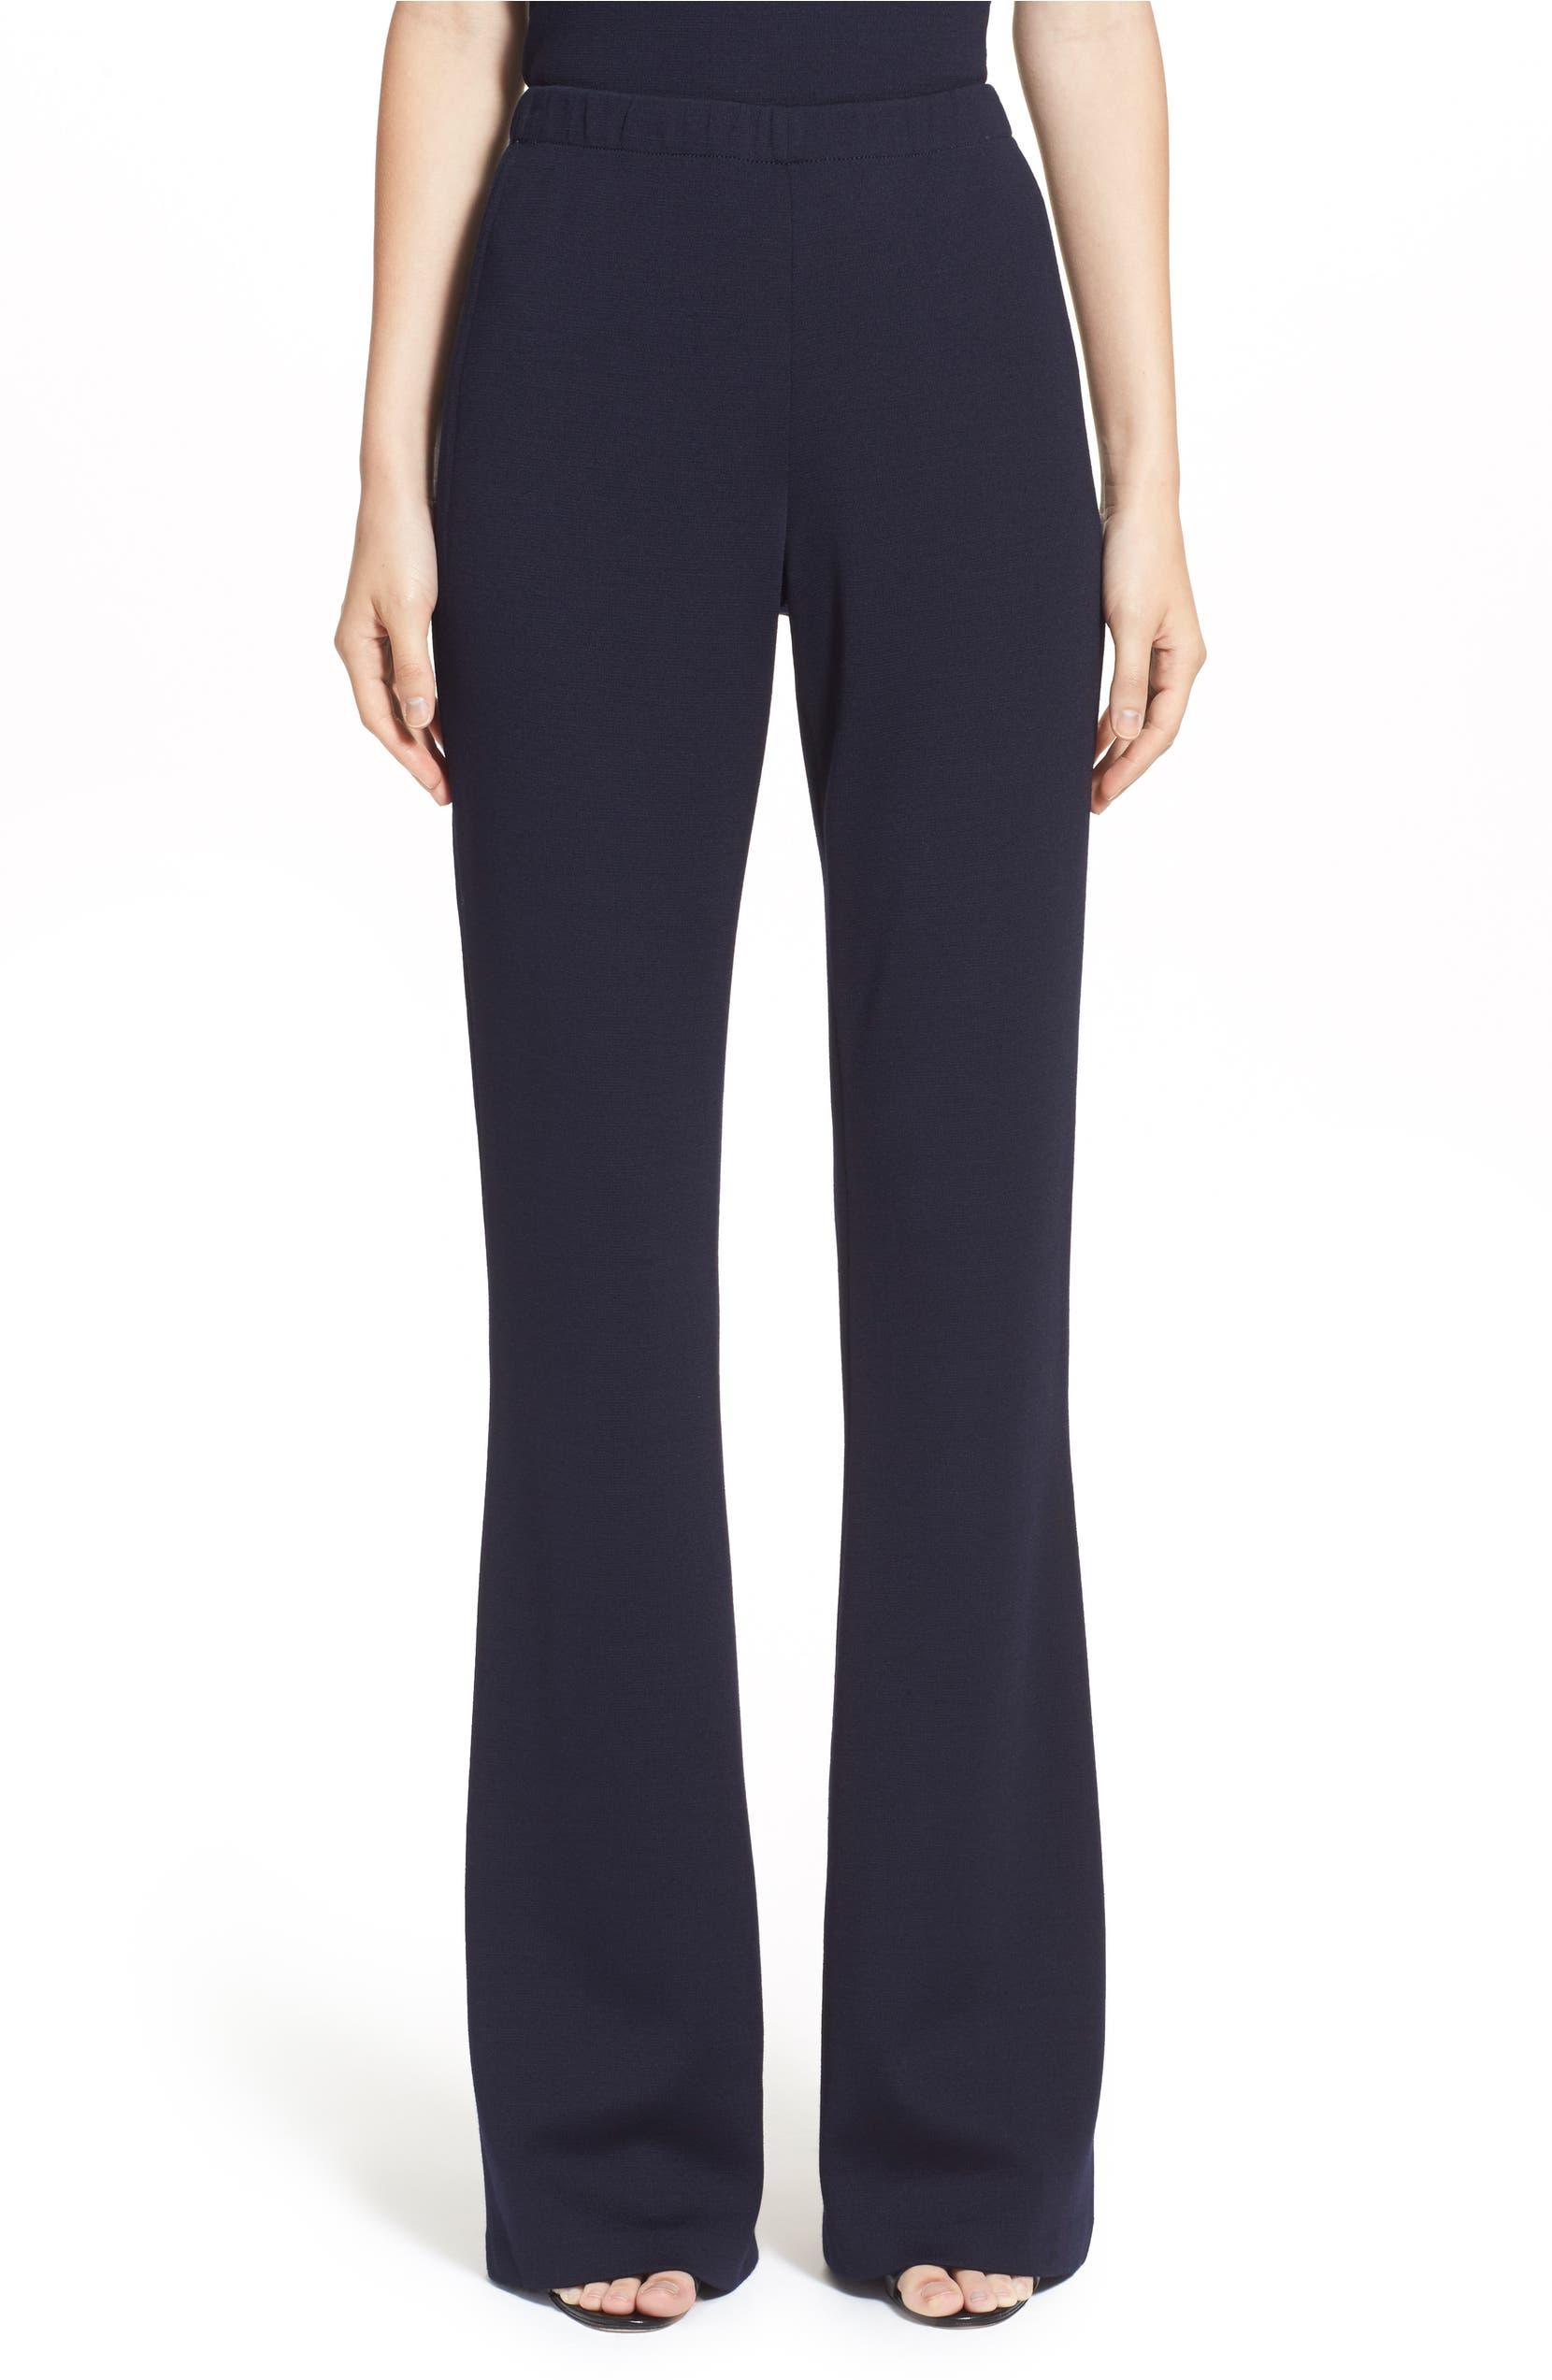 e2d06301b29ff St. John Collection 'Kasia' Bootcut Milano Knit Pants   Nordstrom